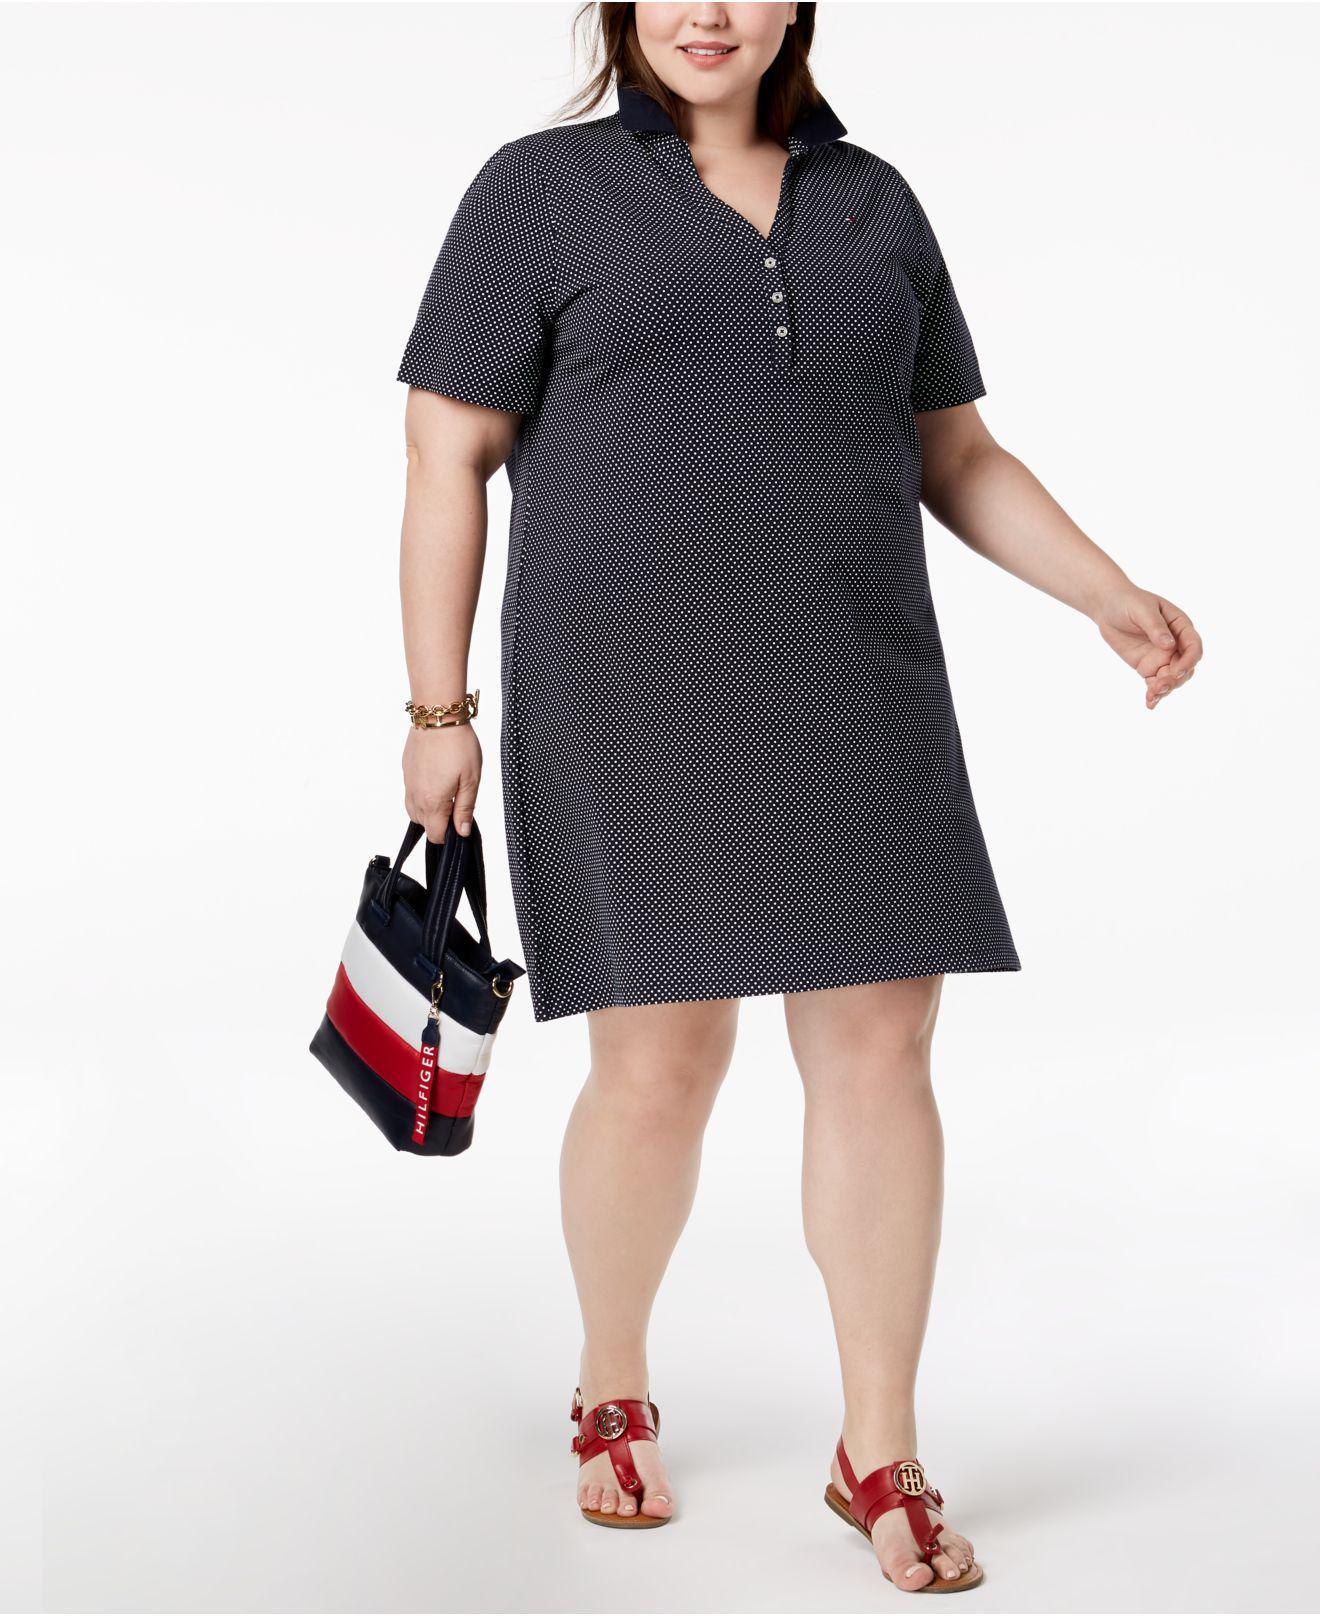 56d21b12dba65 Lyst - Tommy Hilfiger Plus Size Printed Polo Shirtdress